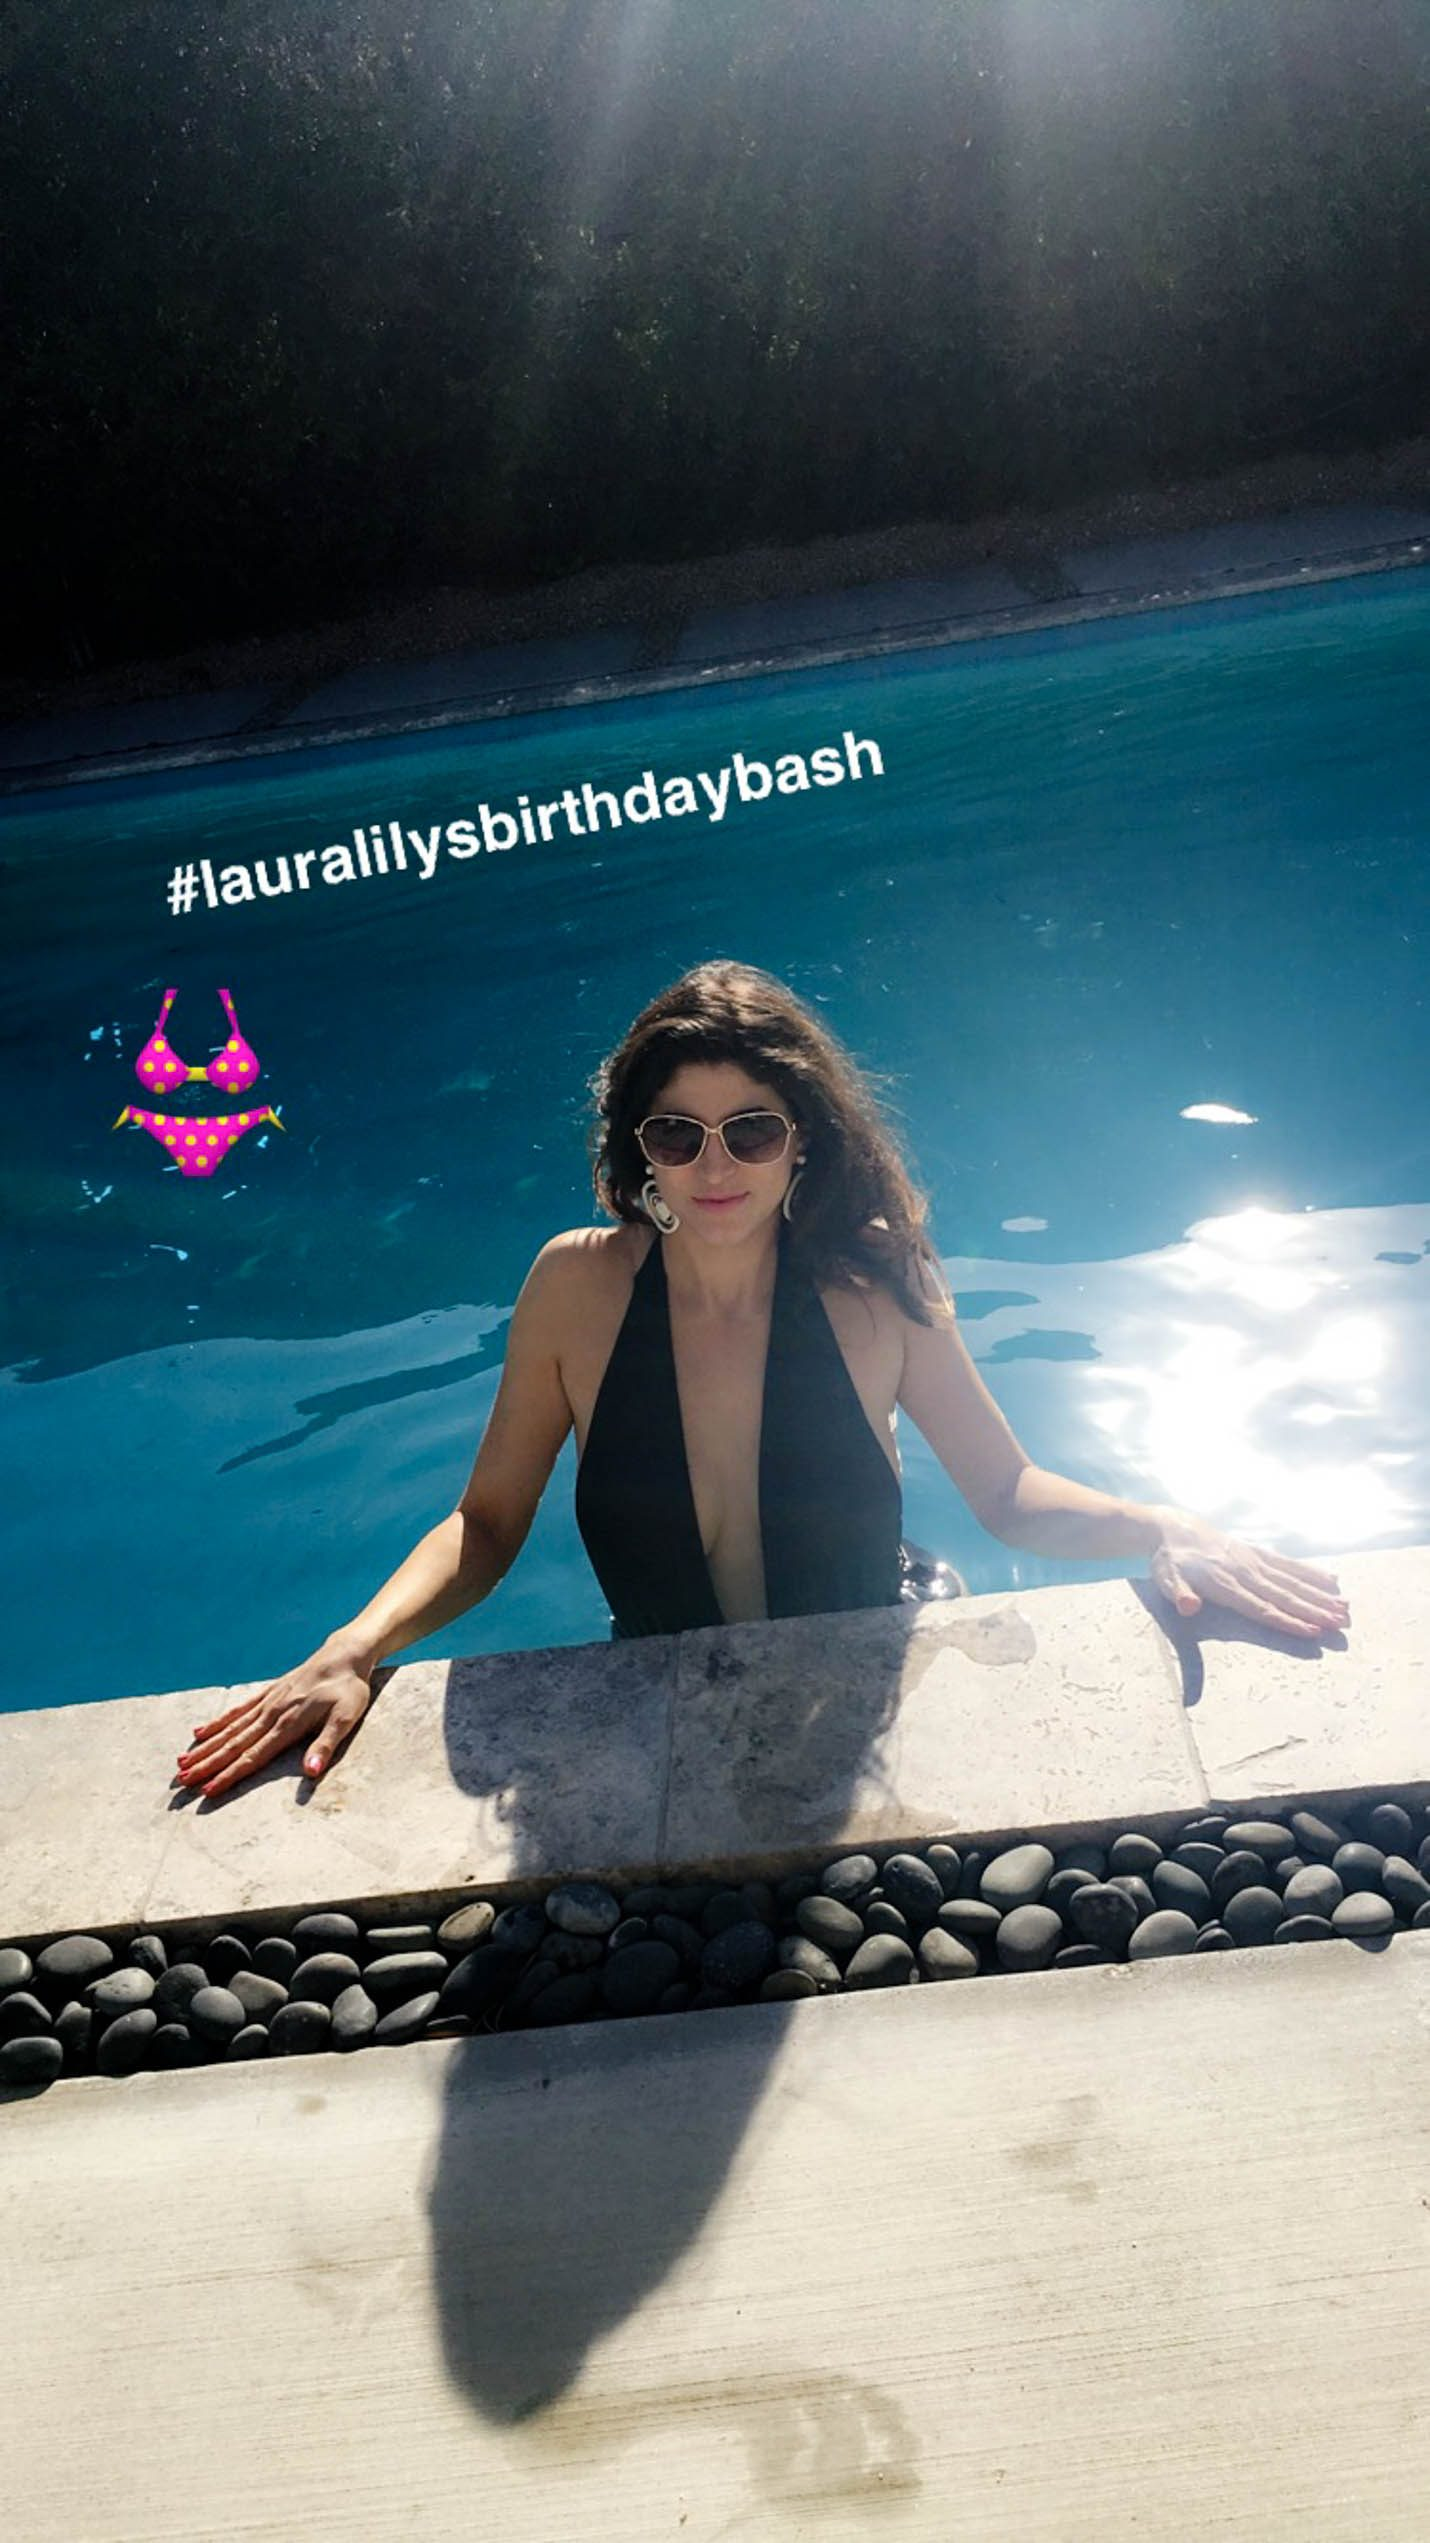 Laura Lily Birthday Bash